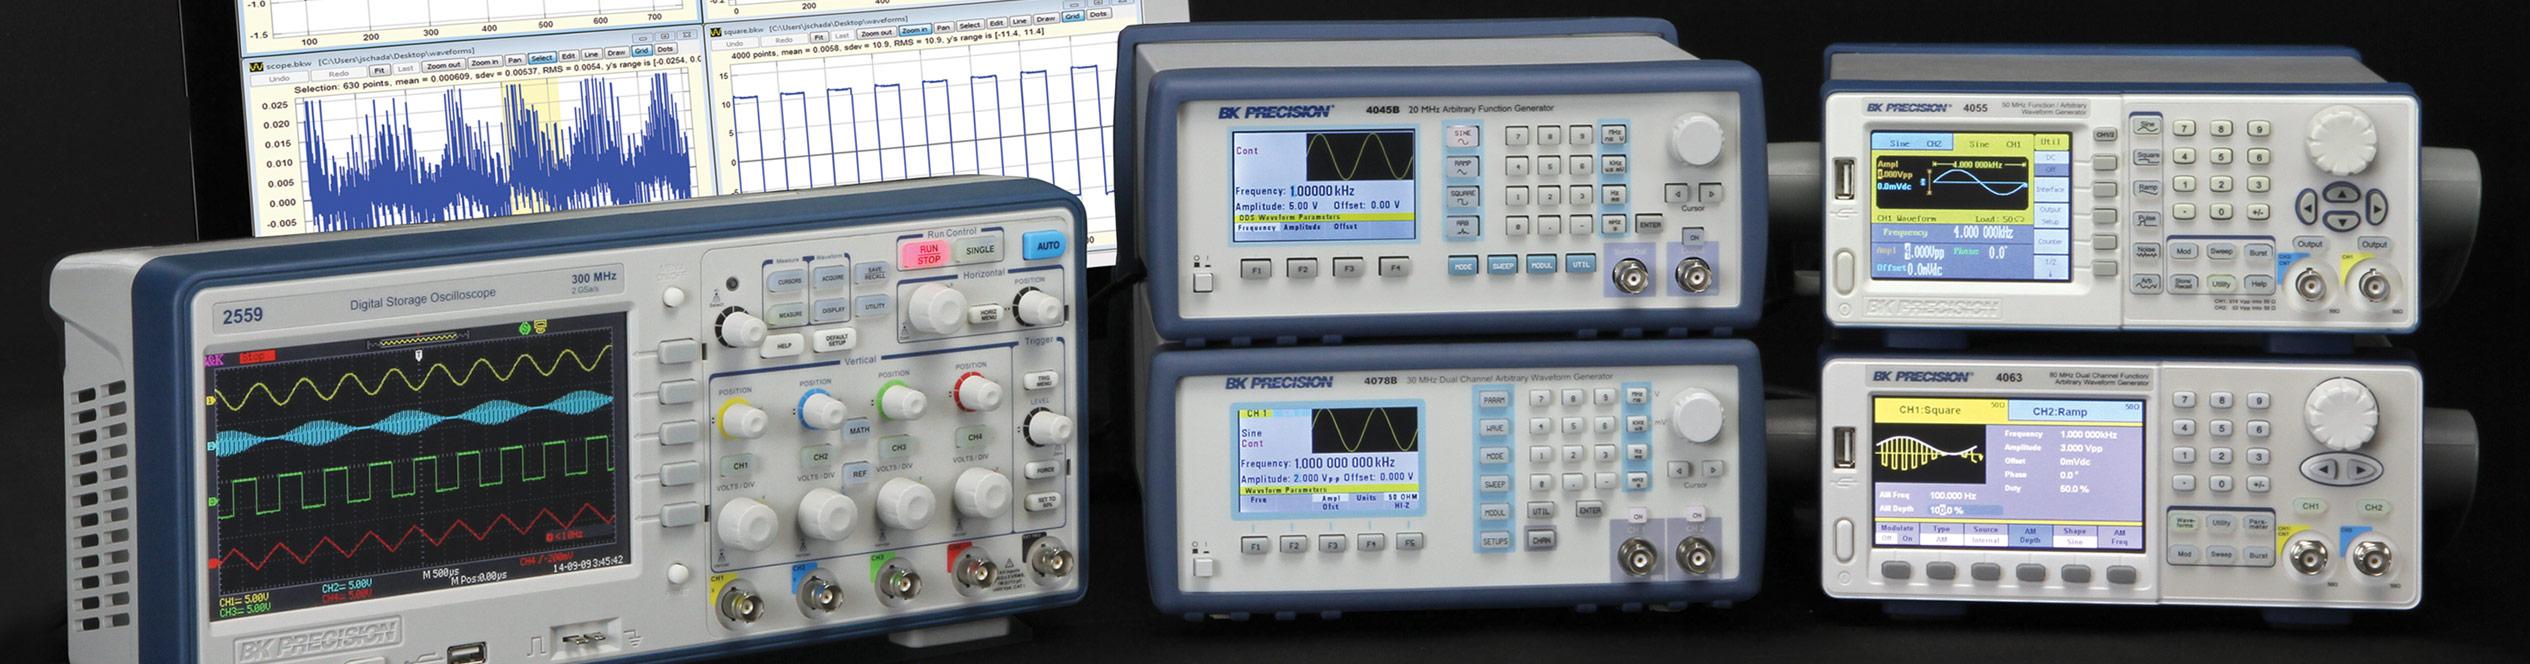 Dual Channel Function Arbitrary Waveform Generators Bk Precision Signal Generator Solutions